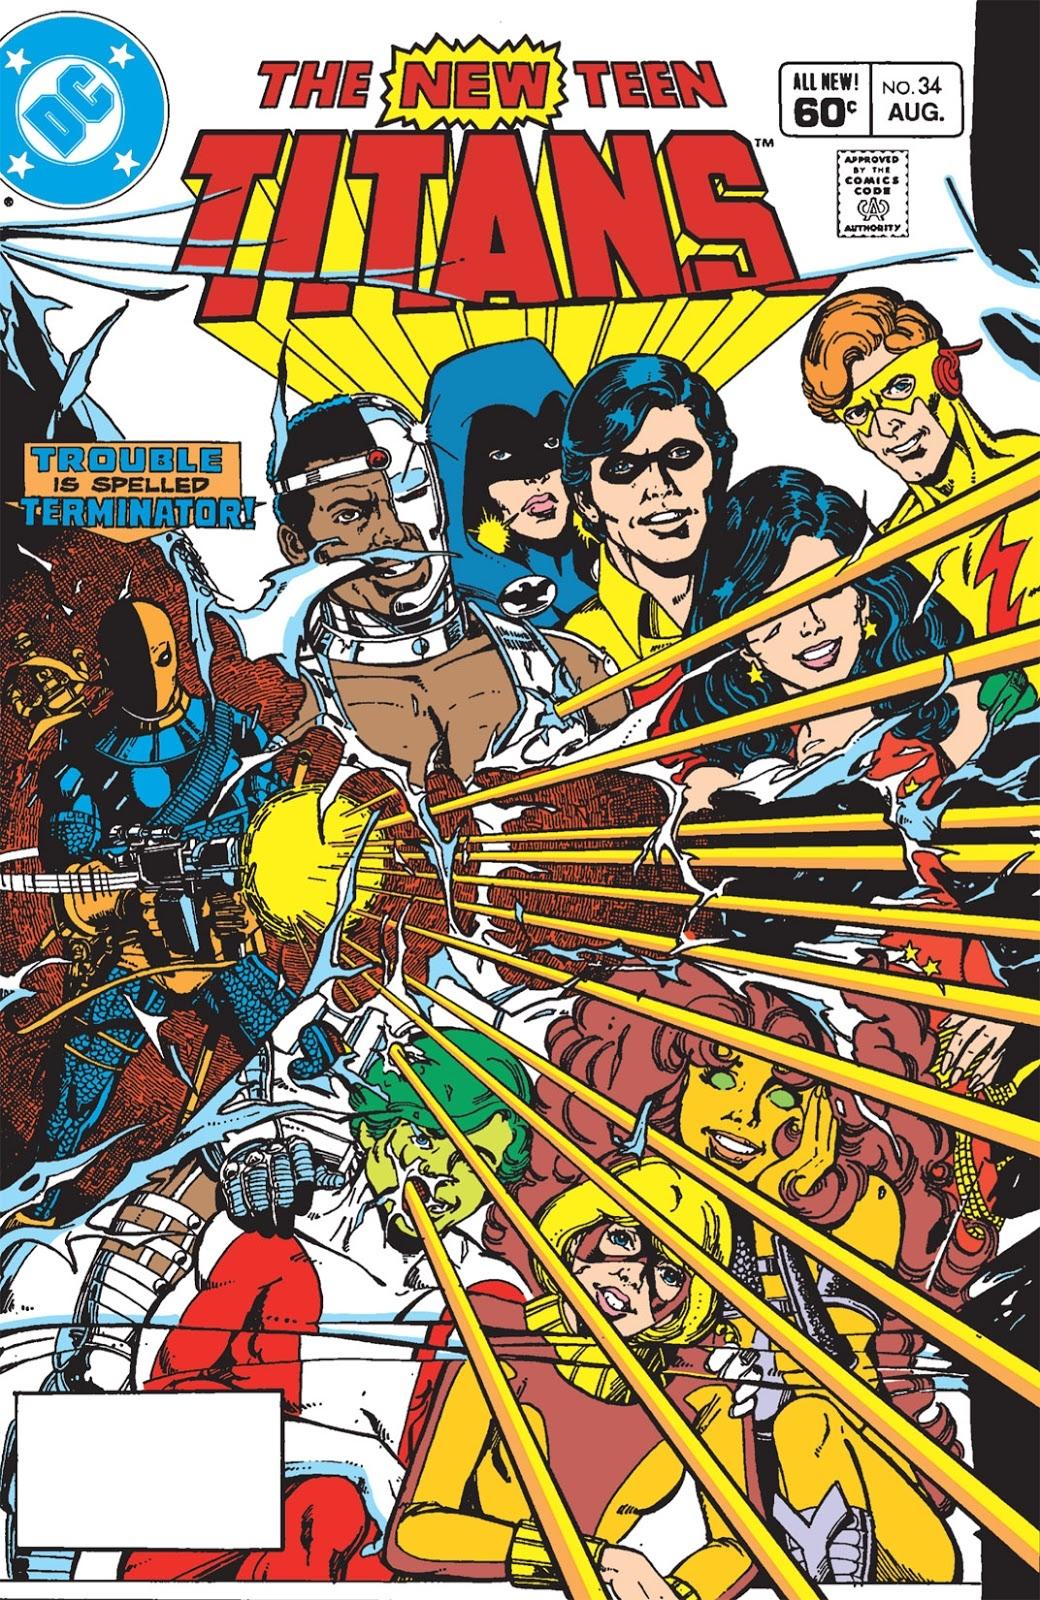 New Teen Titans #34 – Reviews Of Old Comics